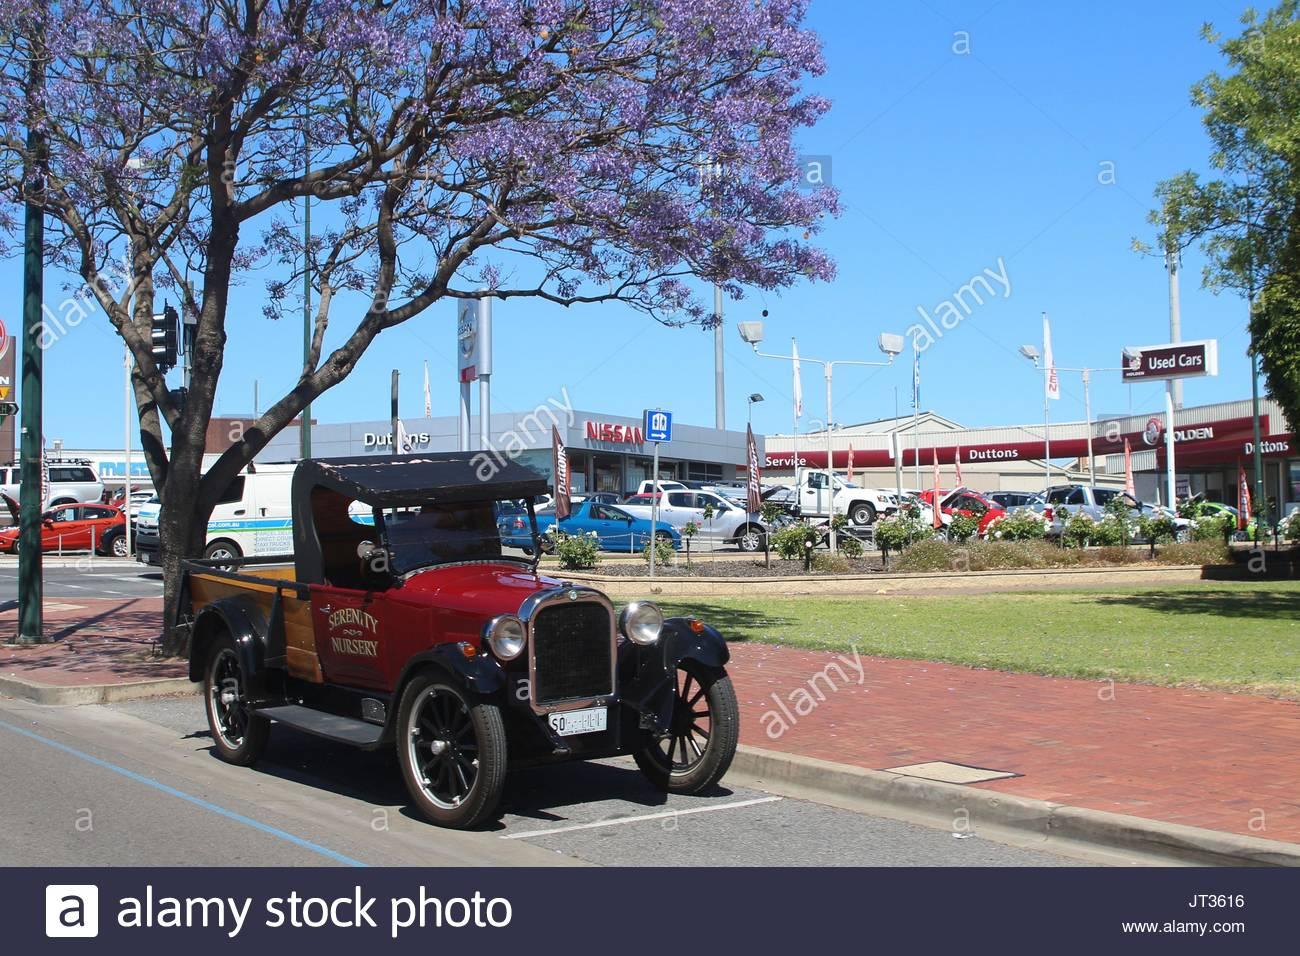 Old-timer car parked under a jacaranda tree, Murray bridge, South Australia - Stock Image